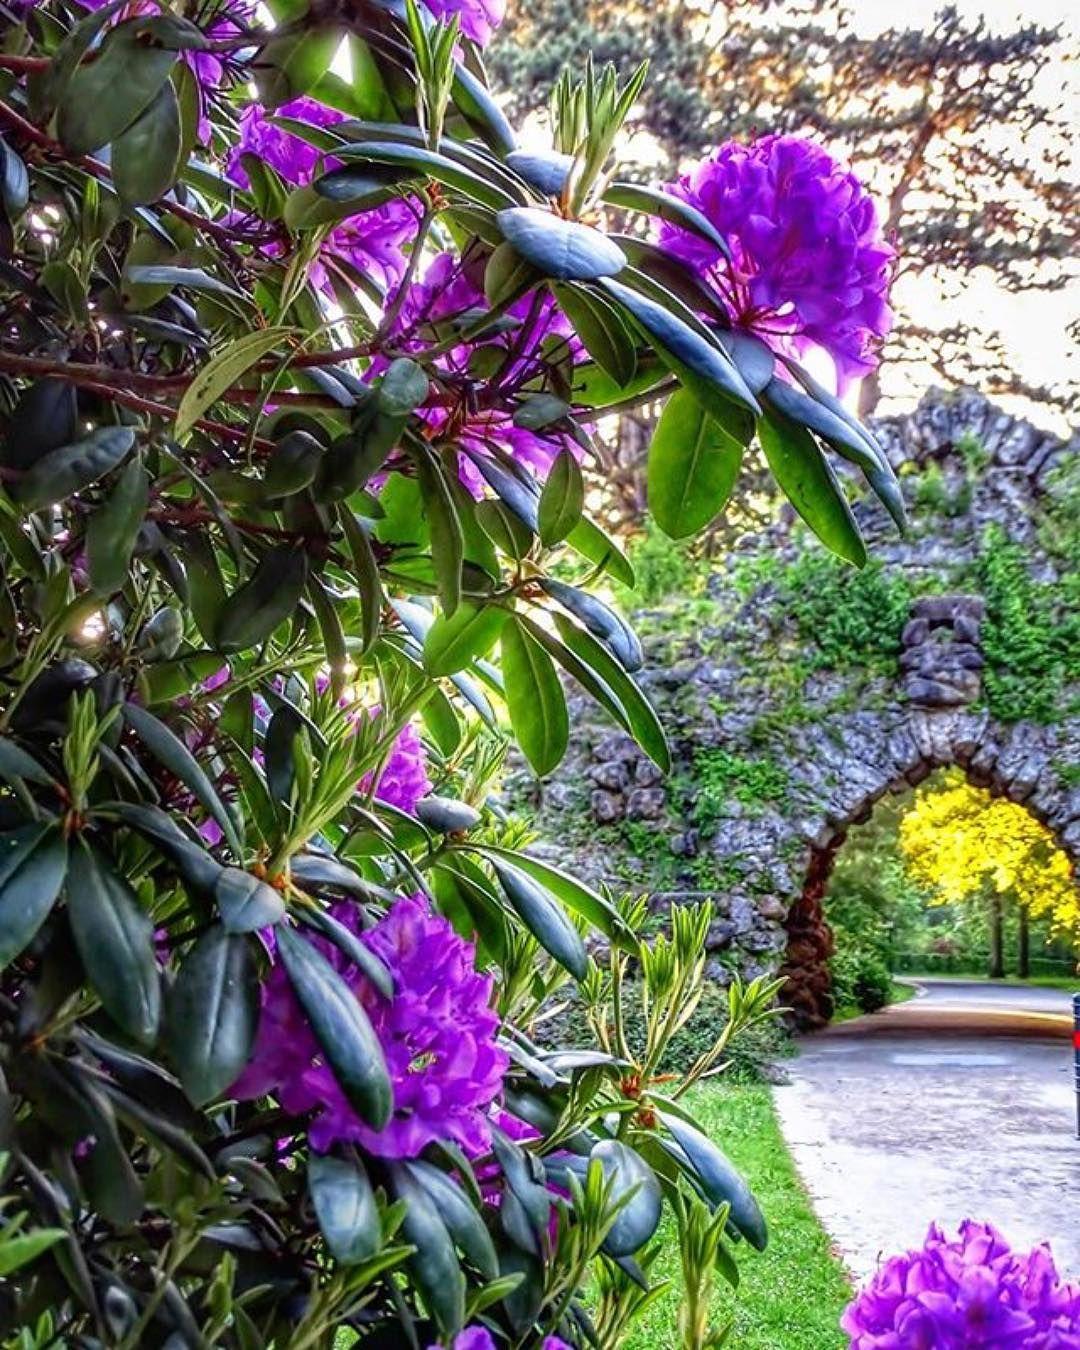 Wunderbare Blutenpracht Am Parnass In Der Eremitage Beautiful Blossoms In The Hermitage In Bayreuth Ramona Sch Plants